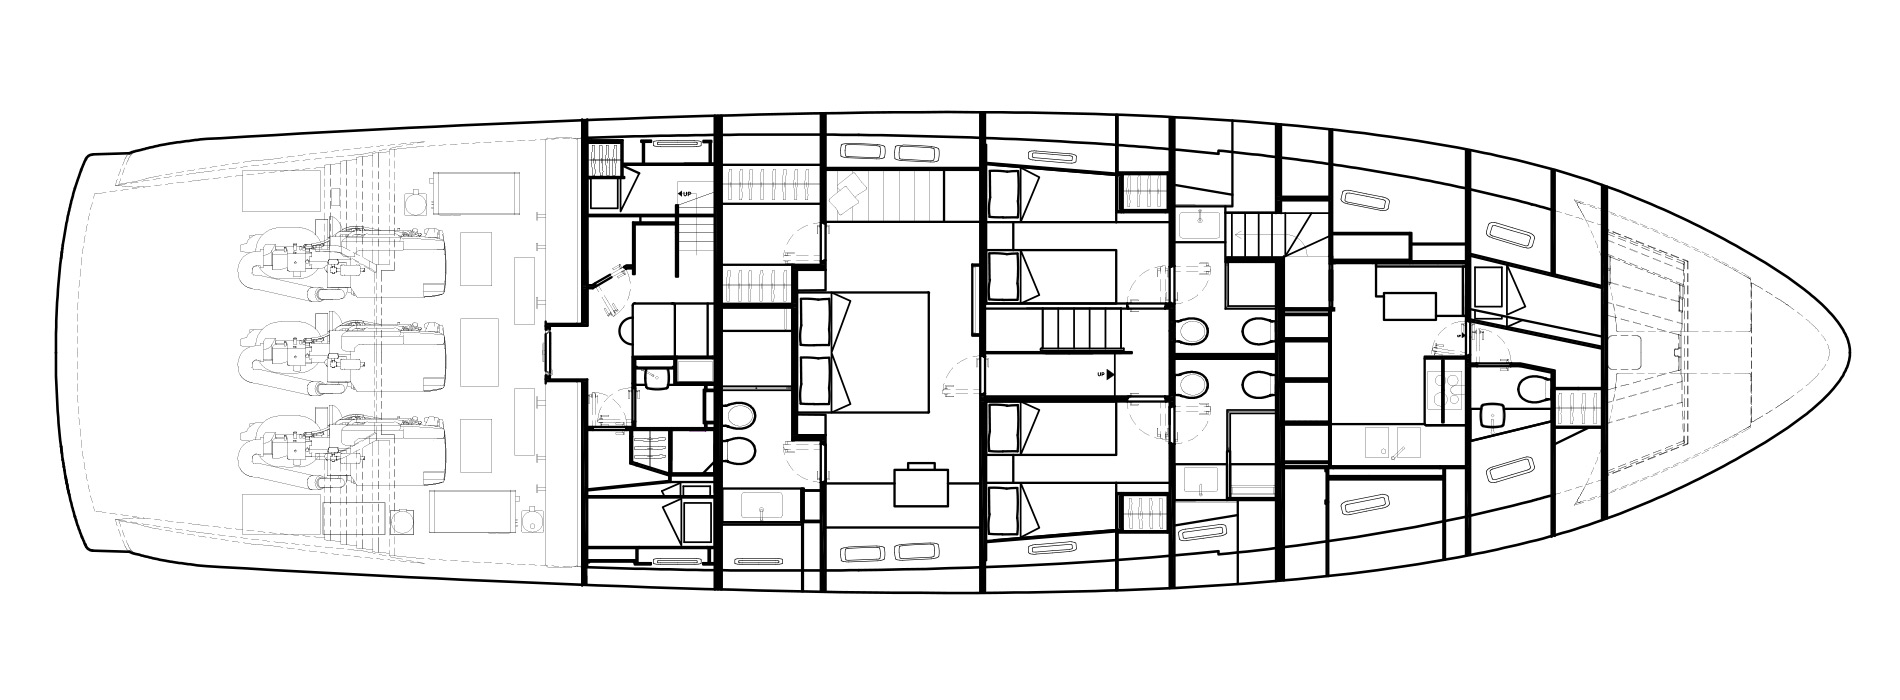 Sanlorenzo Yachts SX88 Lower Deck Version C